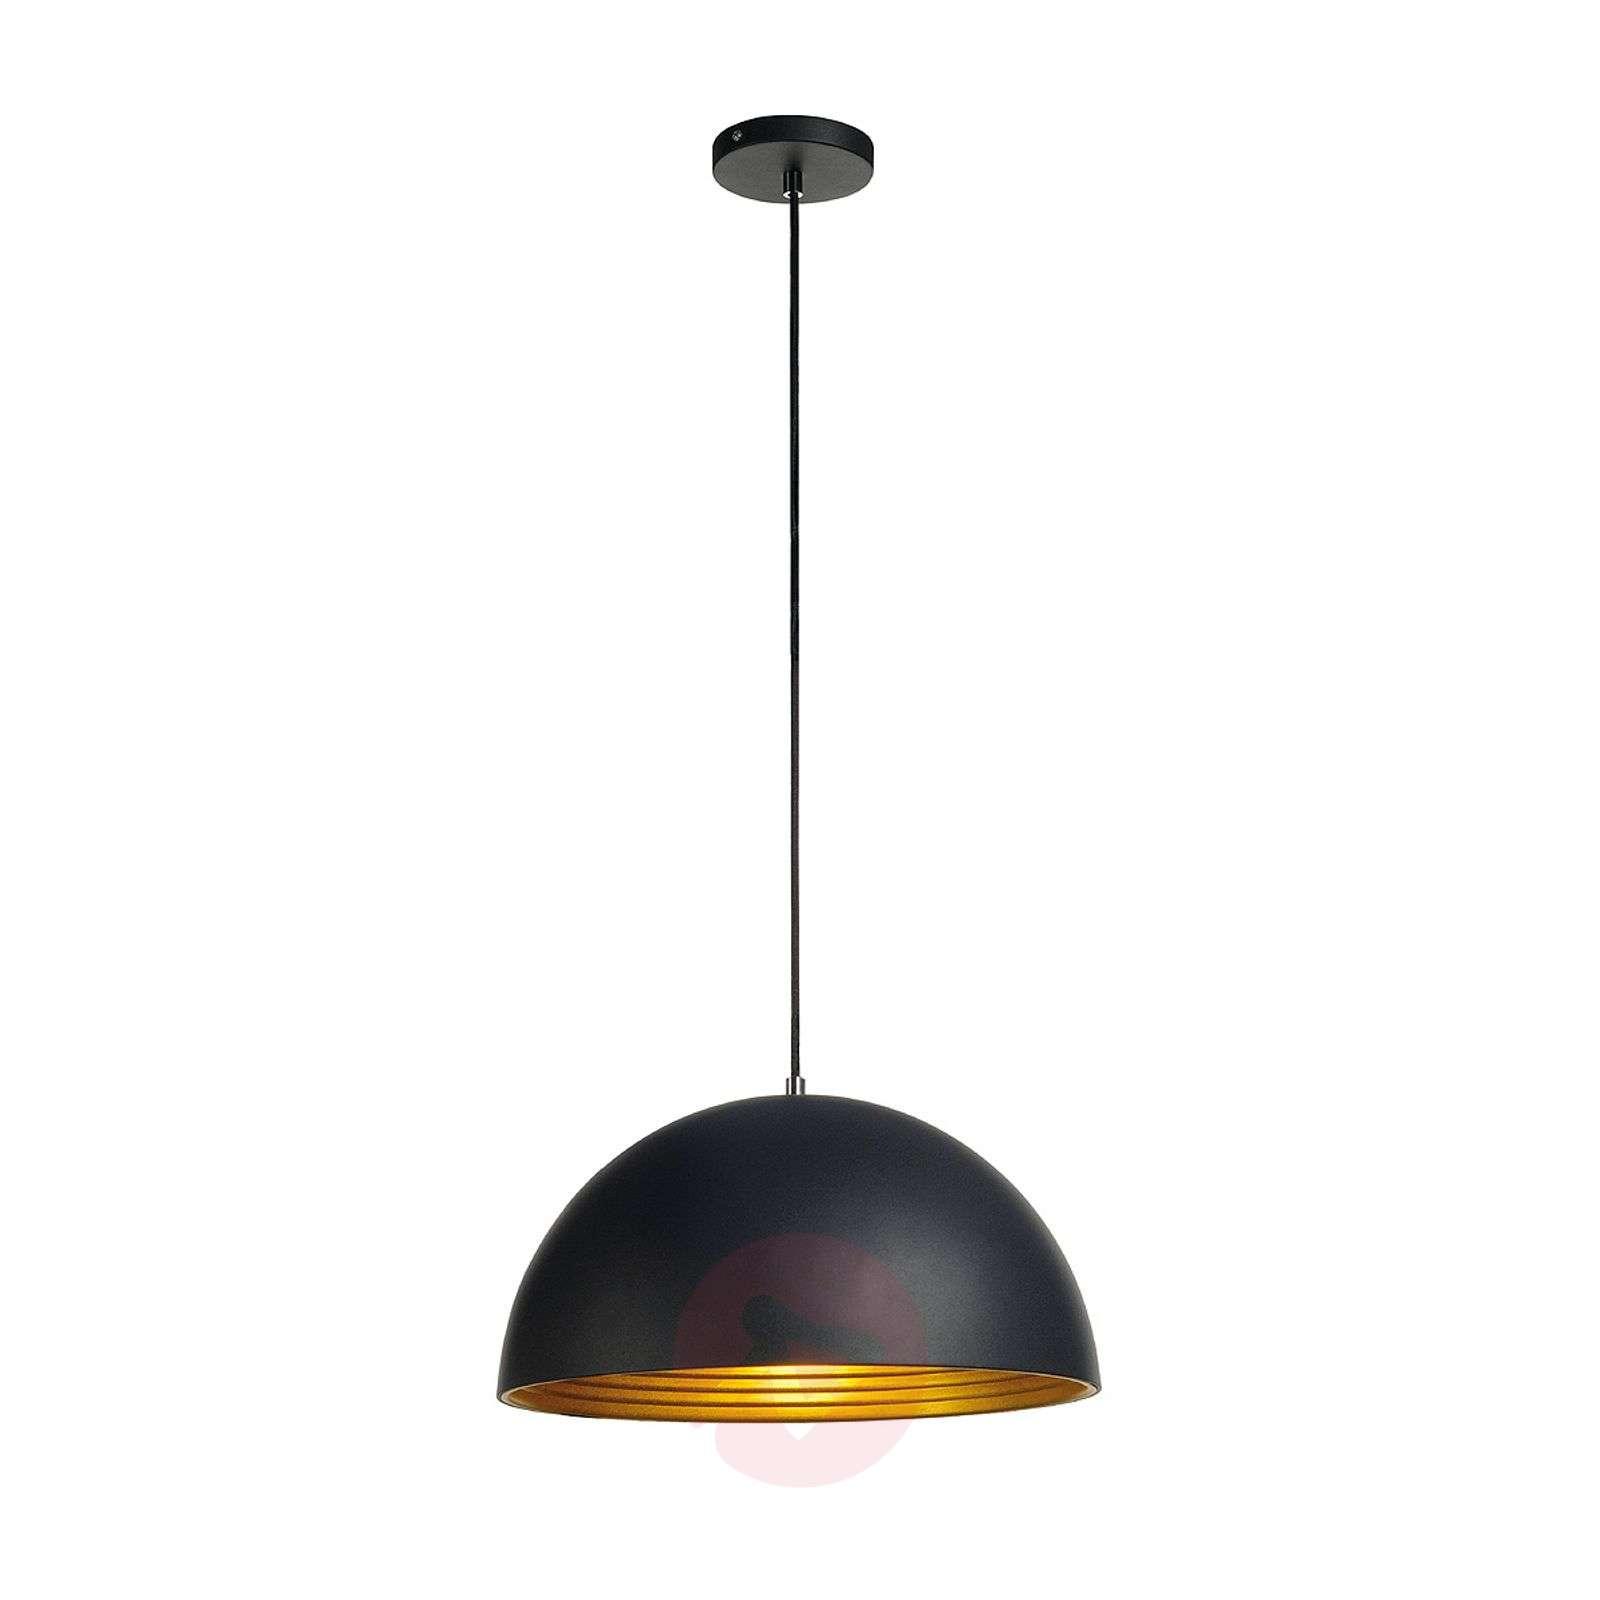 Forchini M Pendant Lamp 40 cm Black/Gold-5504426-01